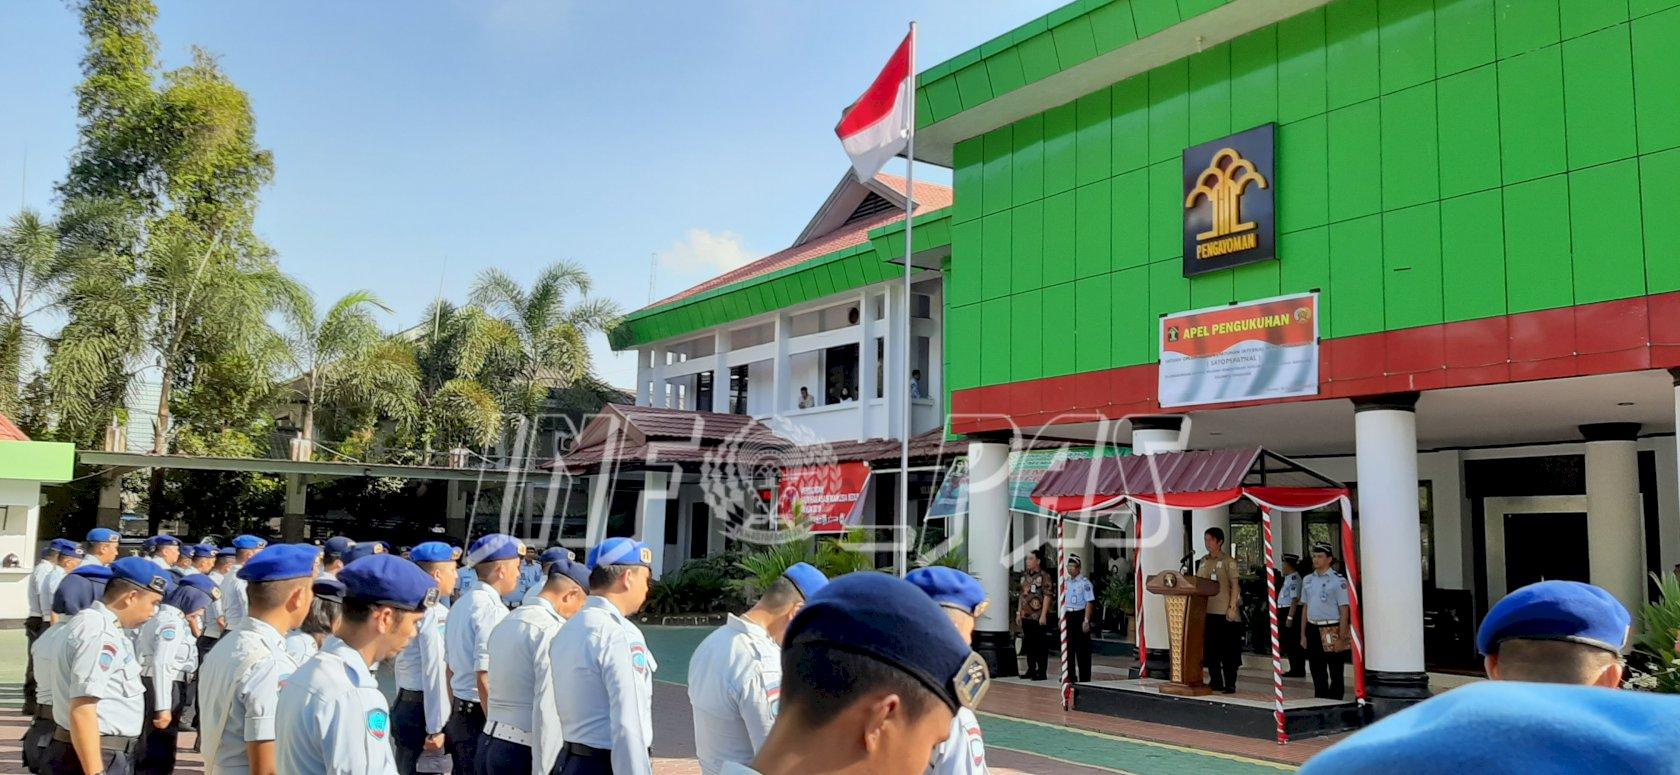 Satopspatnal KemenkumHAM Sulawesi Tenggara Telah Dikukuhkan